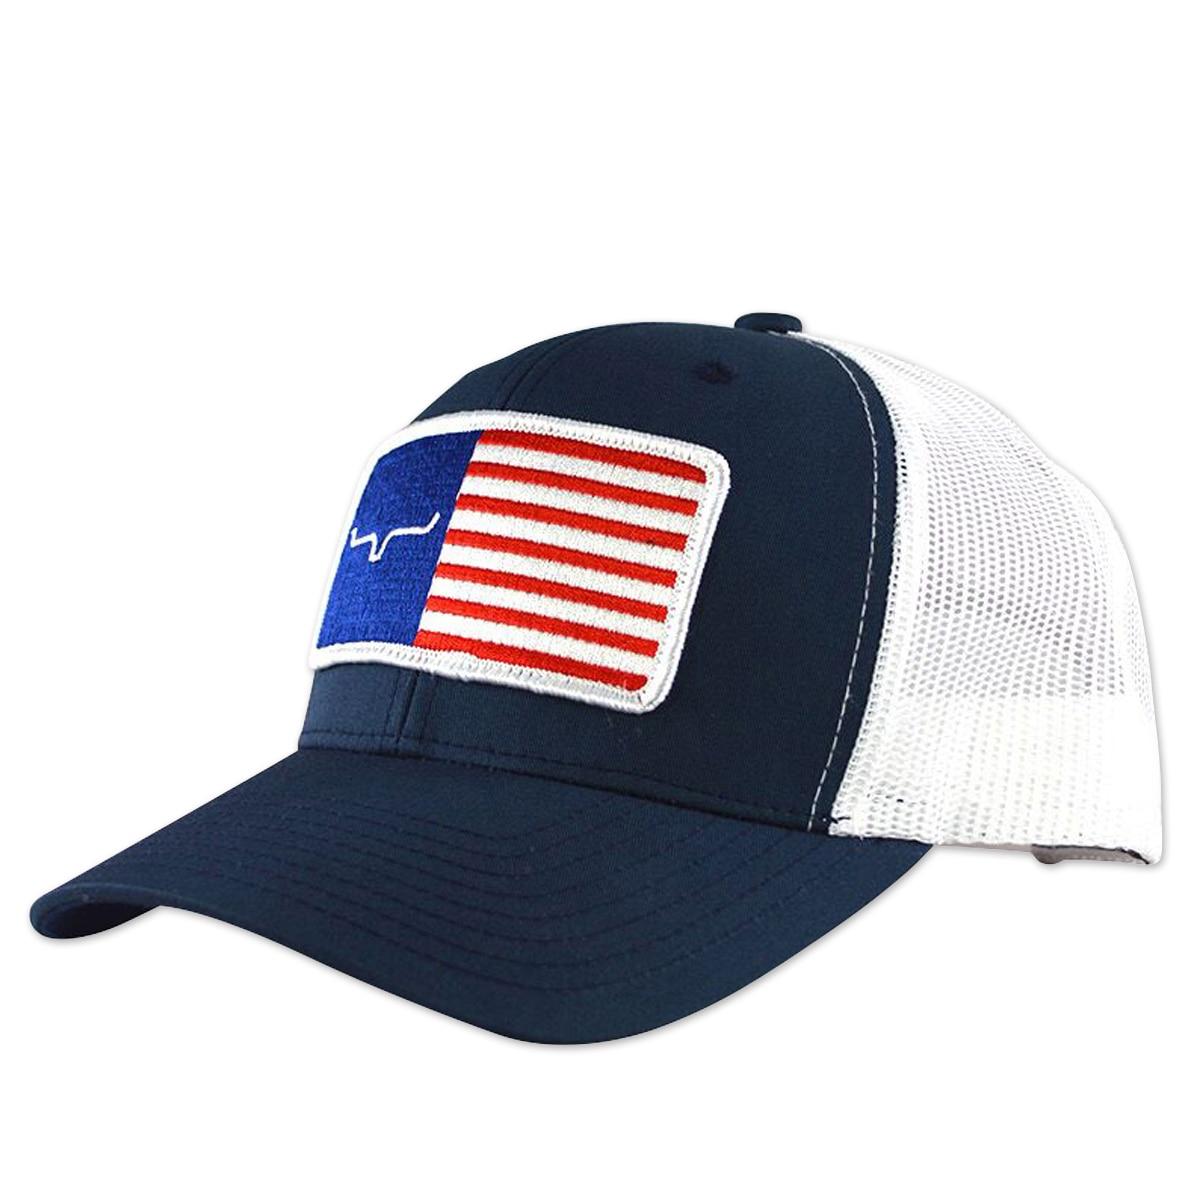 22d8245757b78 Kimes Ranch American Trucker Hat